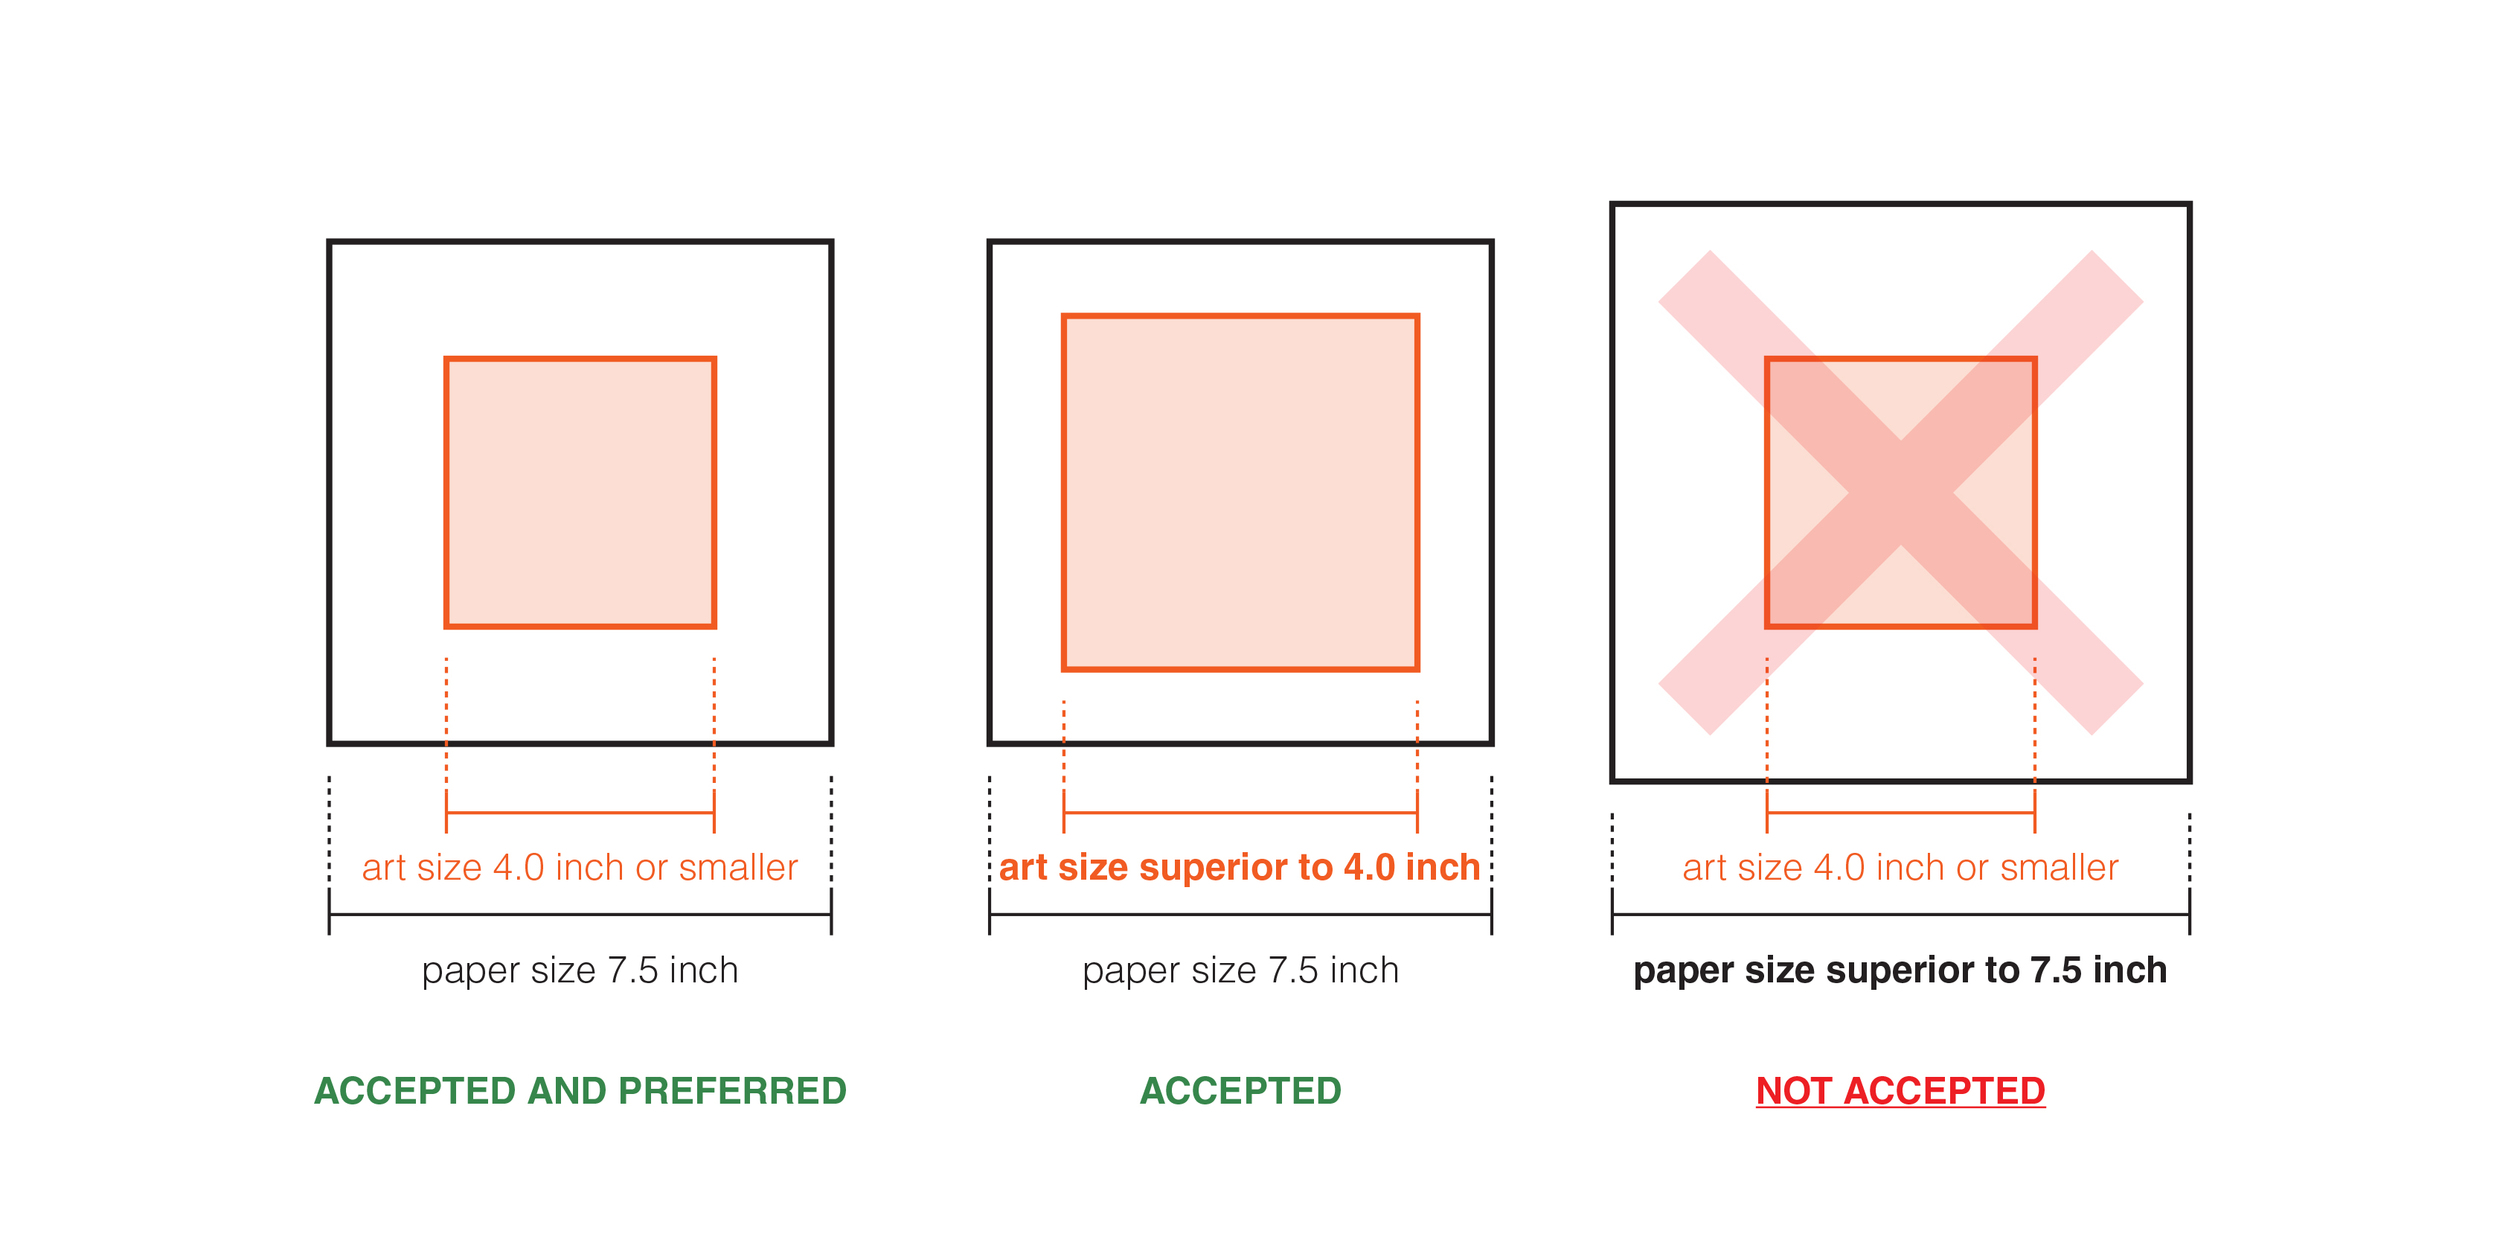 141013_miniprint paper art sizes.jpg